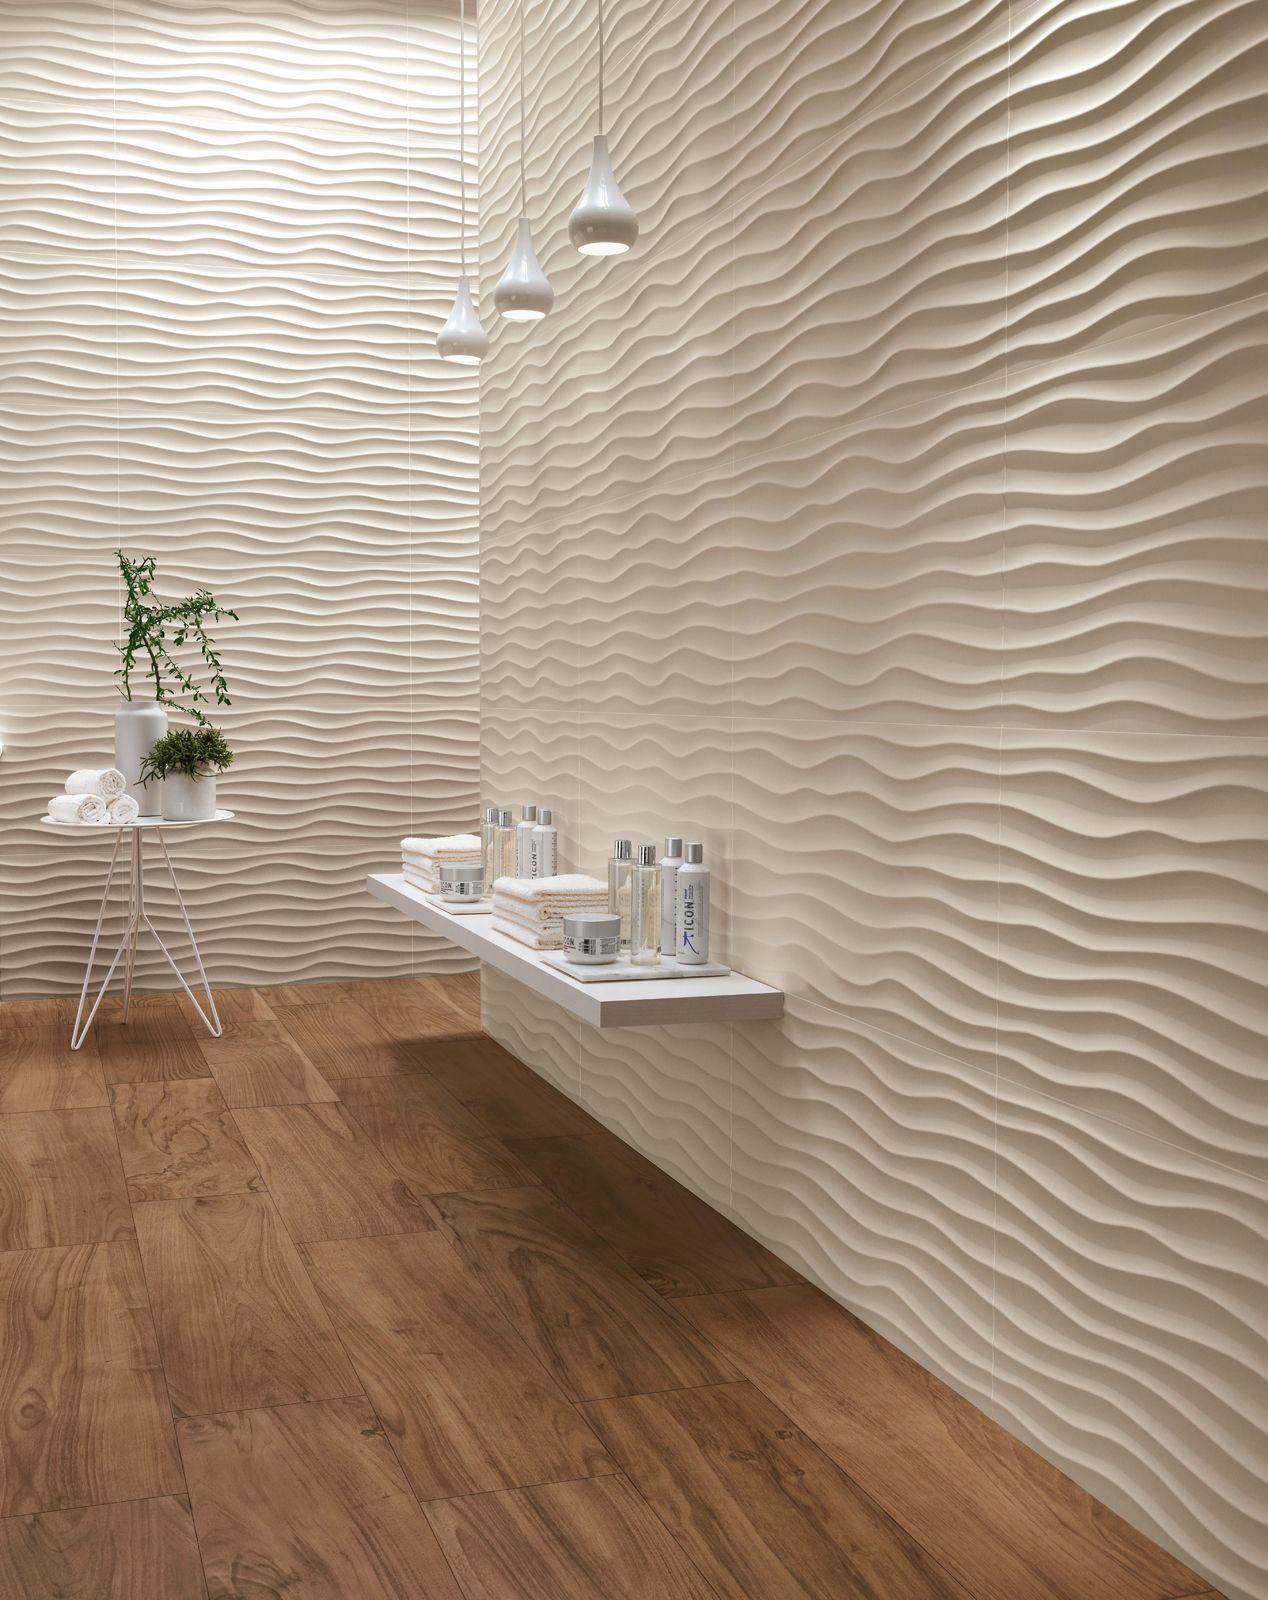 Minoli Tiles 3d Wall Design 3d Wall Design Dune Sand Matt By Minoli Is A New 3d Ceramic Wall Tile To Mak Wall Cladding Wall Design Bathroom Interior Design